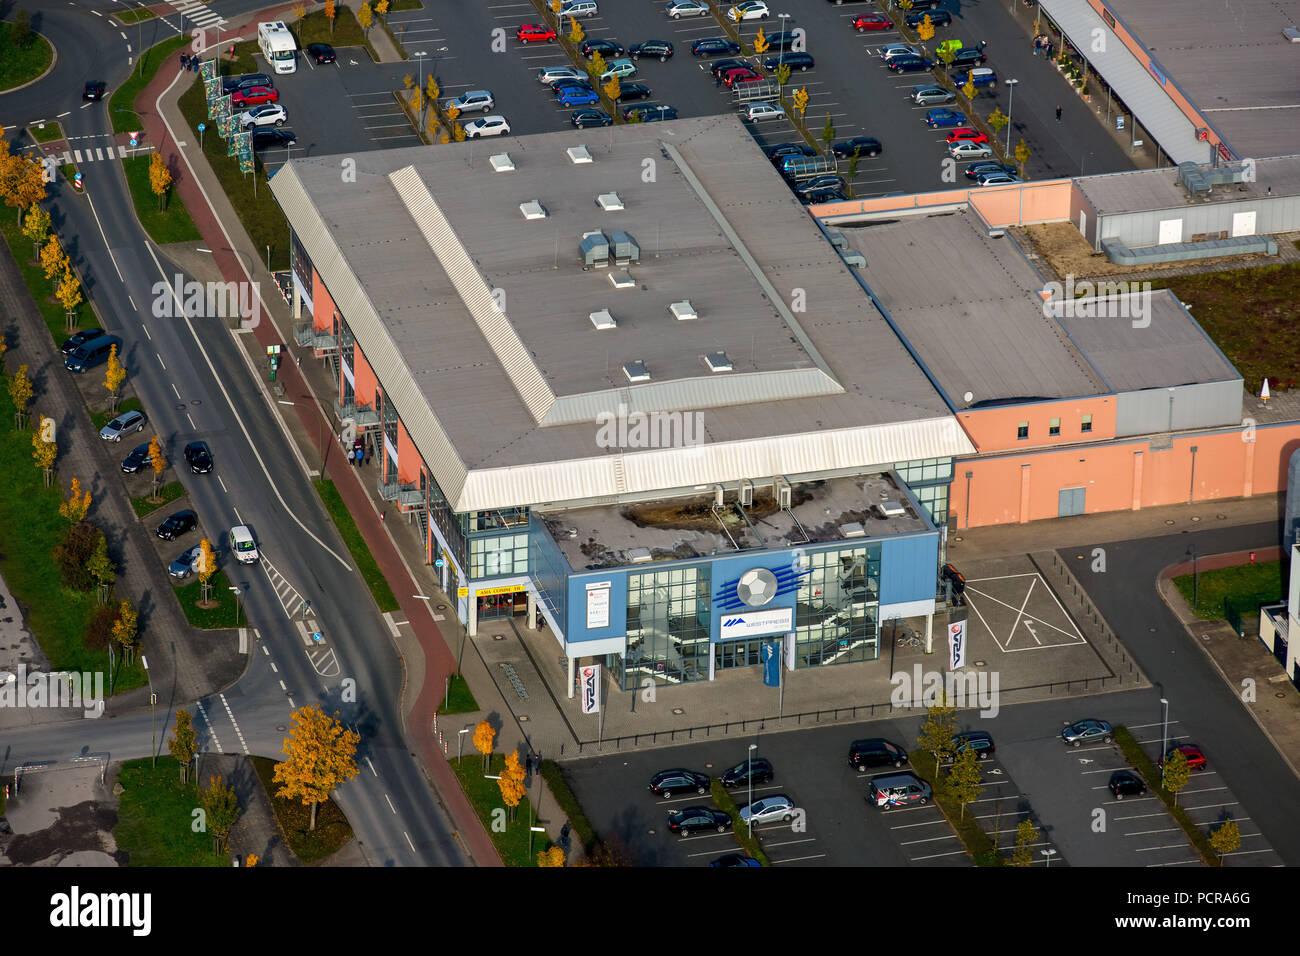 Westpress Arena, Hamm, Ruhr area, North Rhine-Westphalia, Germany - Stock Image